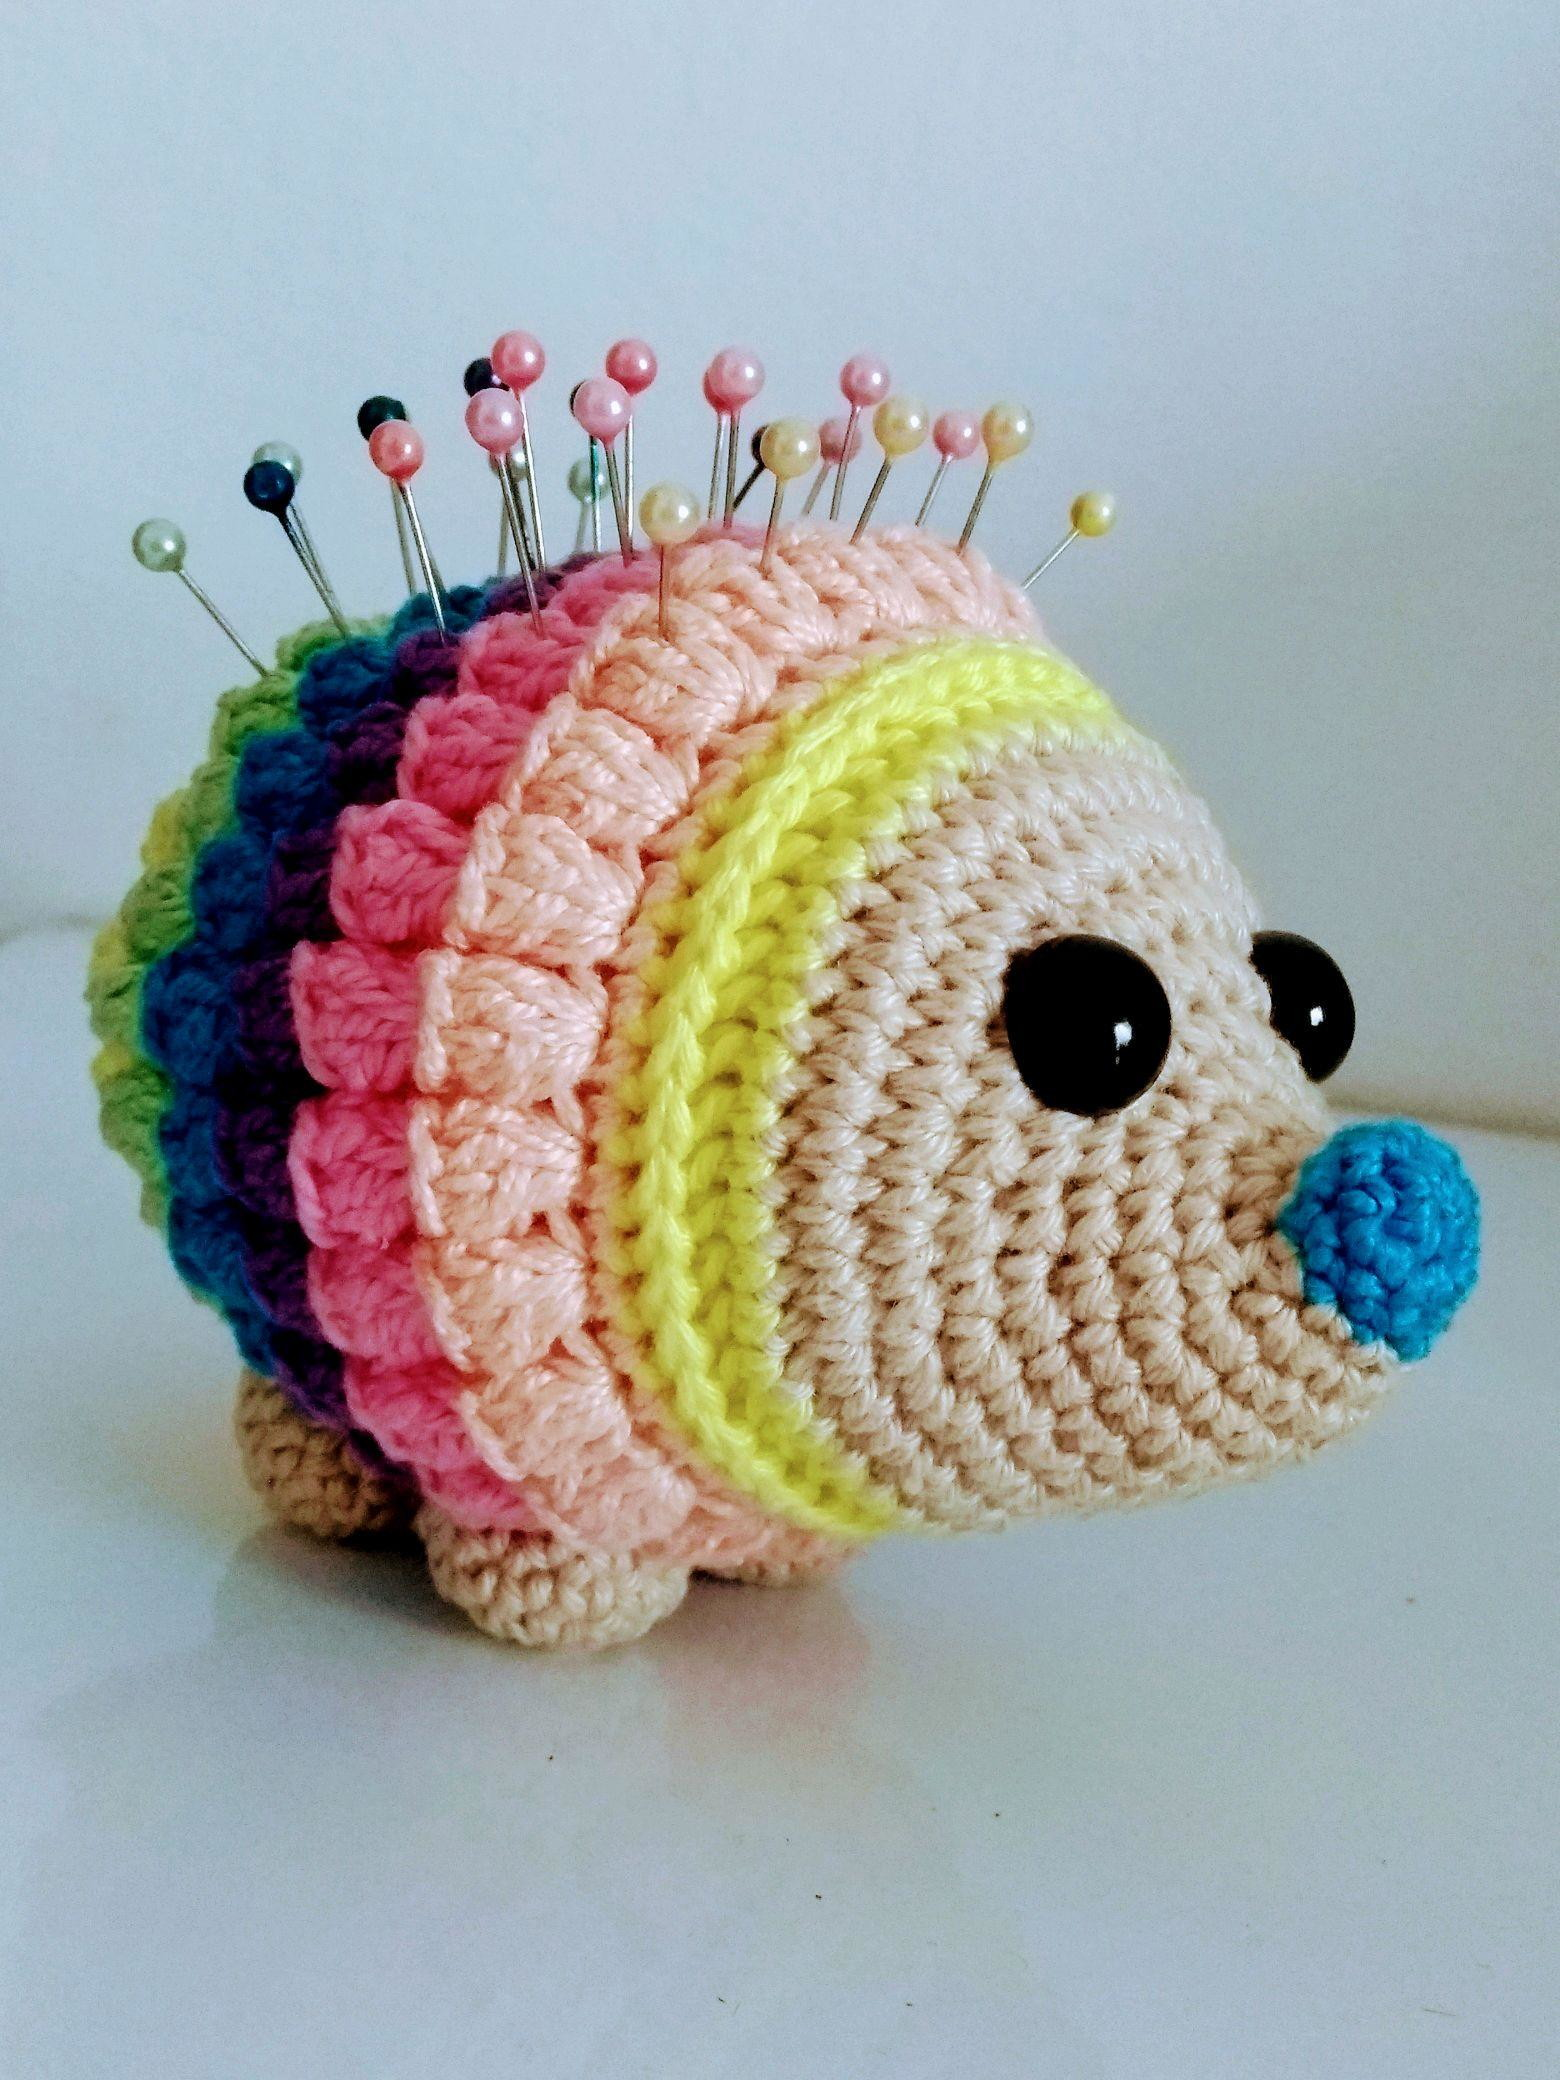 pua pig crochet amigurumi moana / vaiana | Crochet disney, Porco ... | 2080x1560